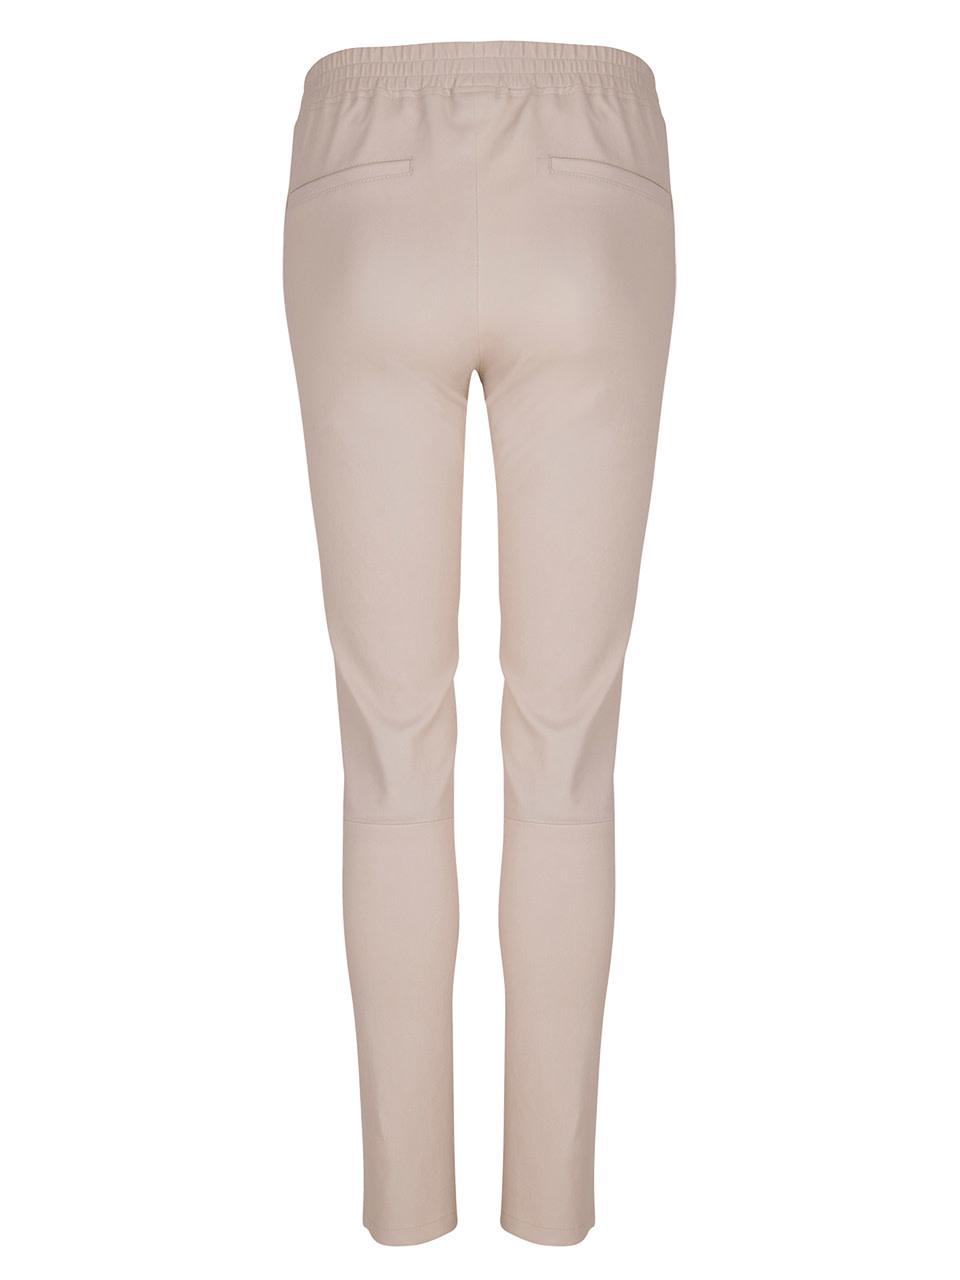 Lebon leather stretch pants Sand-2